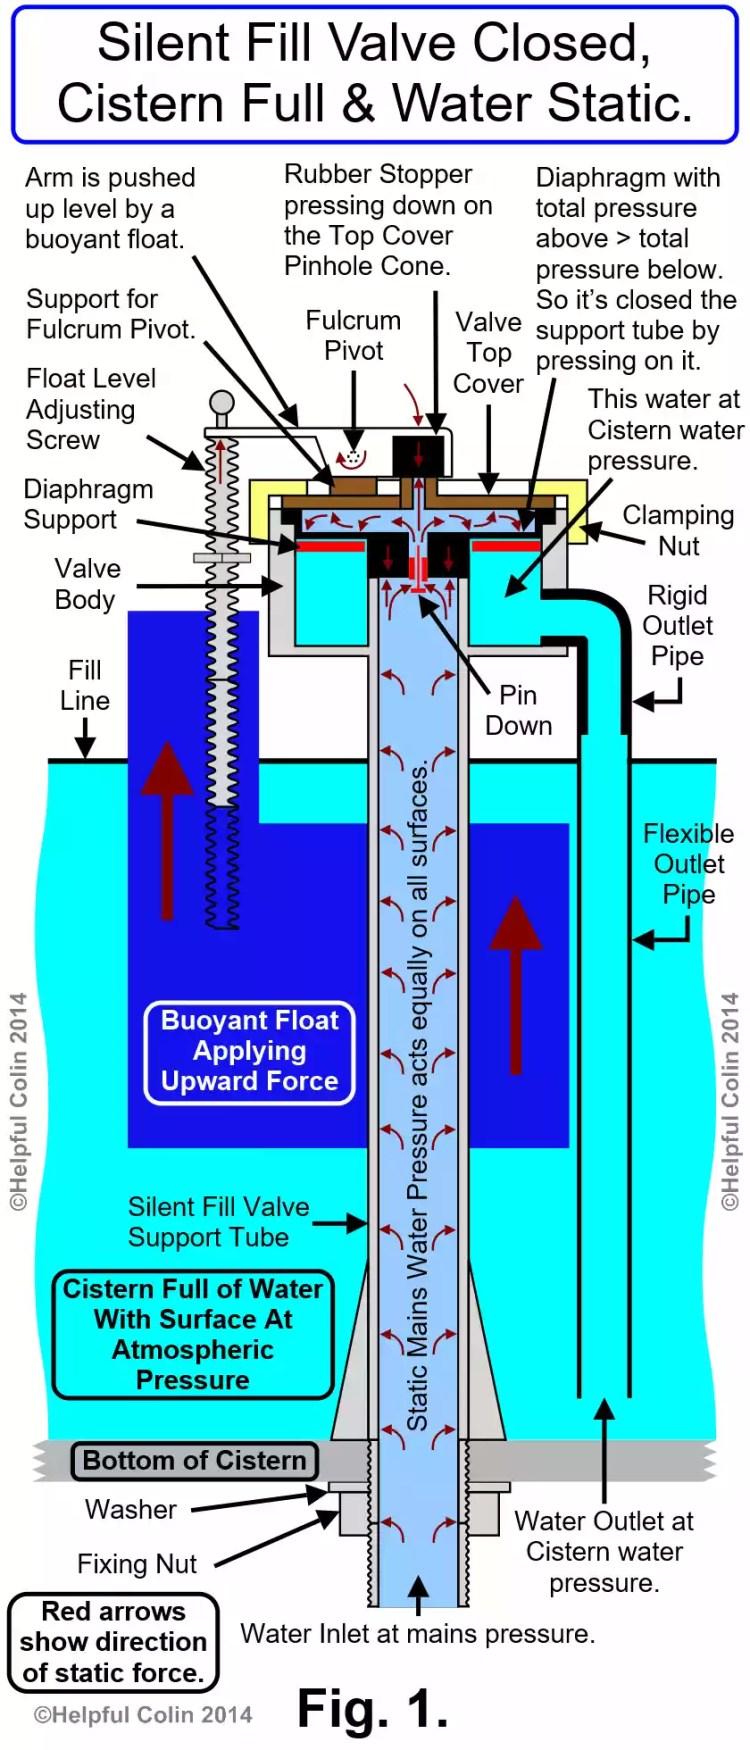 Silent Fill Valve Closed, Cistern Full & Water Static.